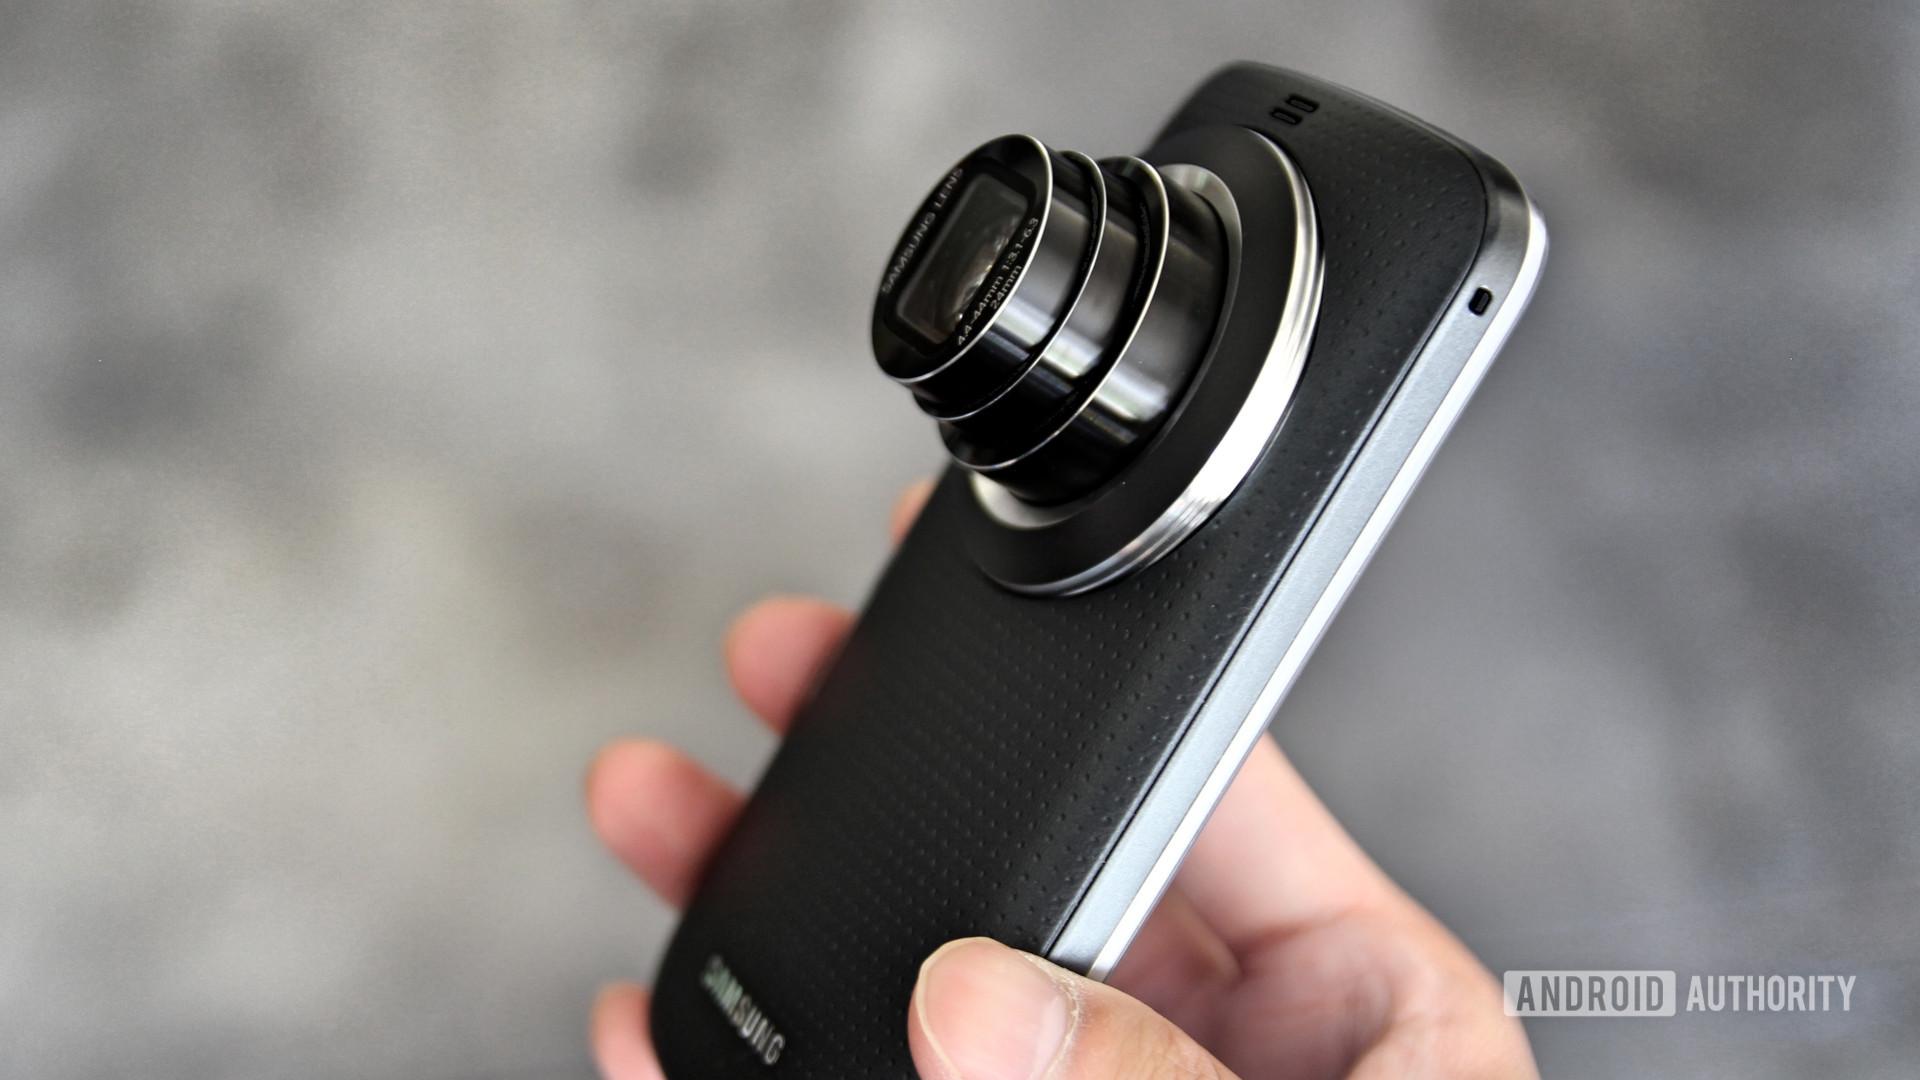 Samsung Galaxy K Zoom zoom lens